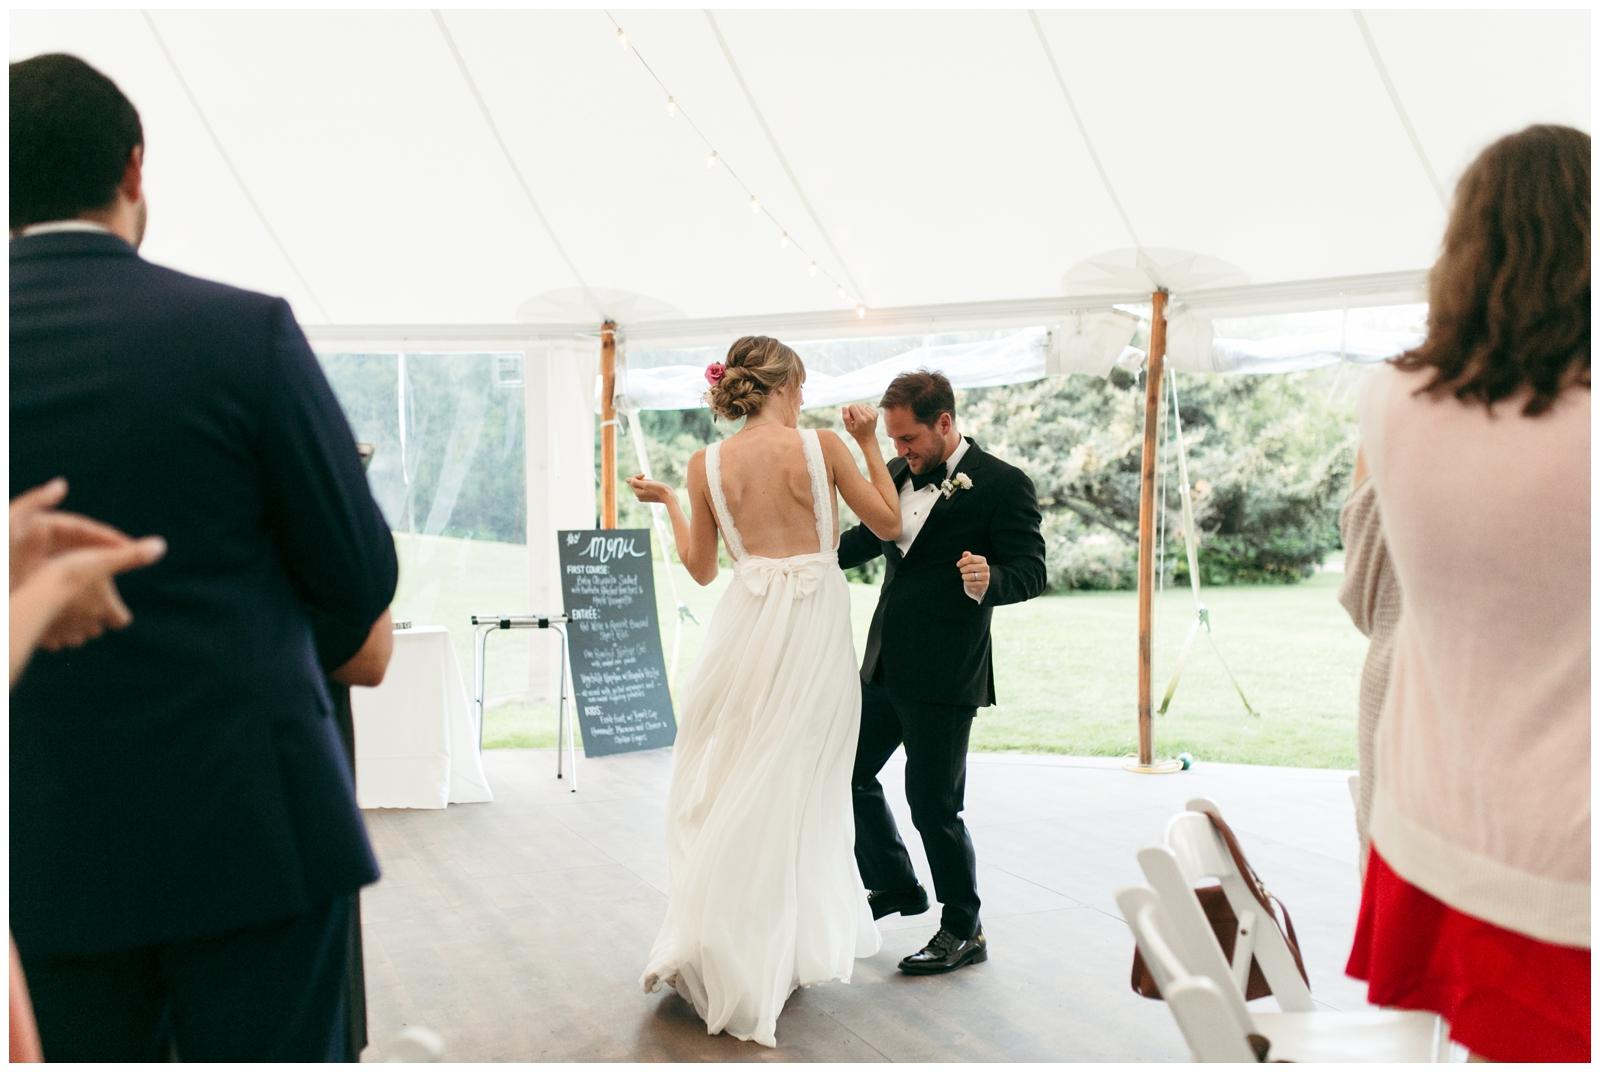 Moraine-Farm-wedding-Bailey-Q-Photo-Massachusetts-wedding-photpgrapher-114.jpg